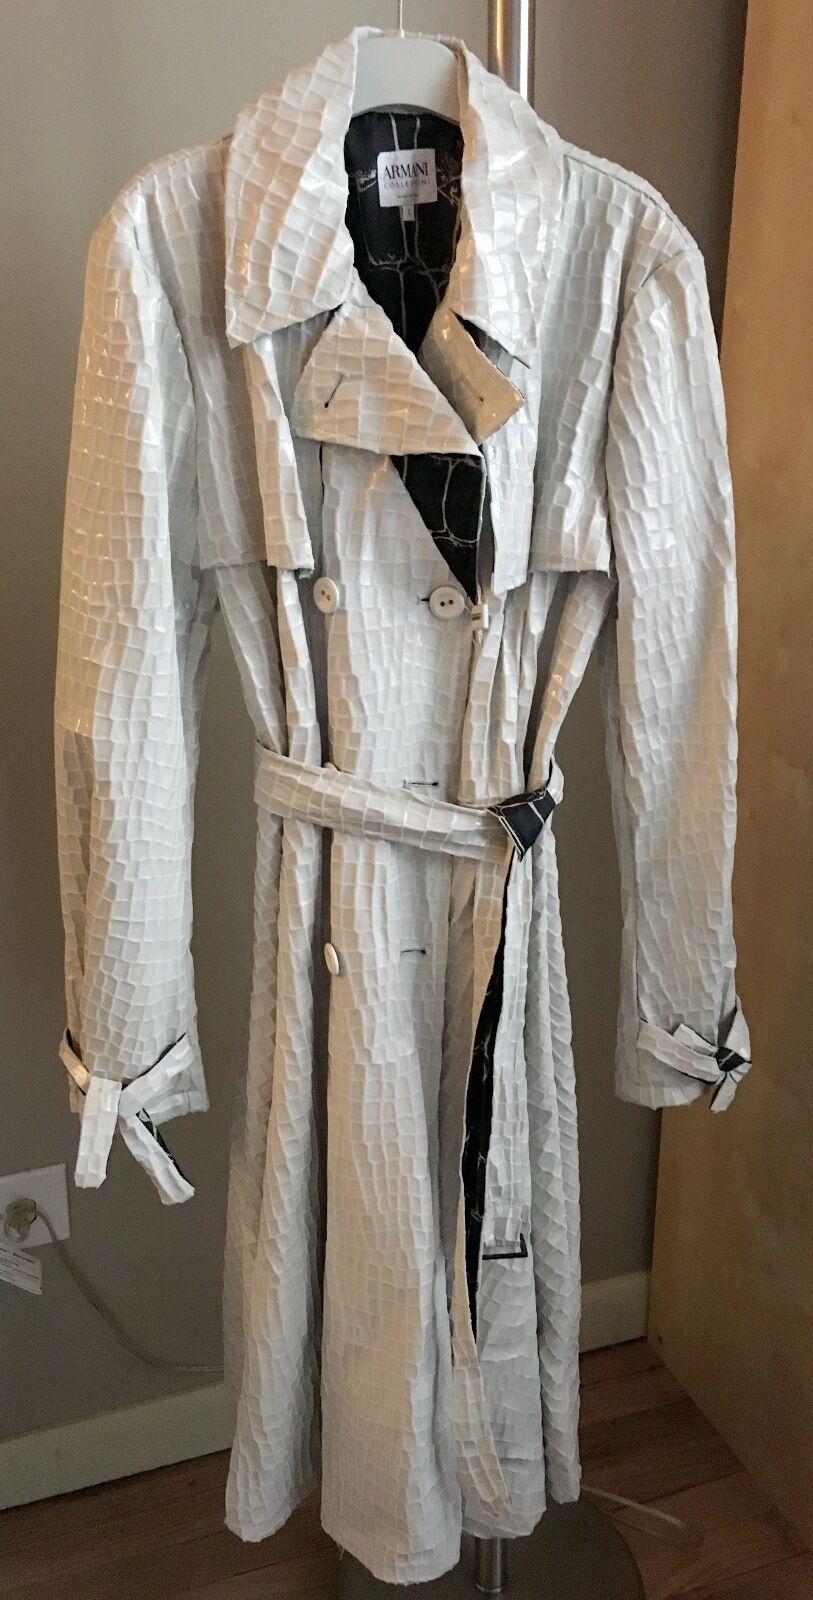 Armani Collezioni - Beige Animal Textured Trench Coat - sz 8